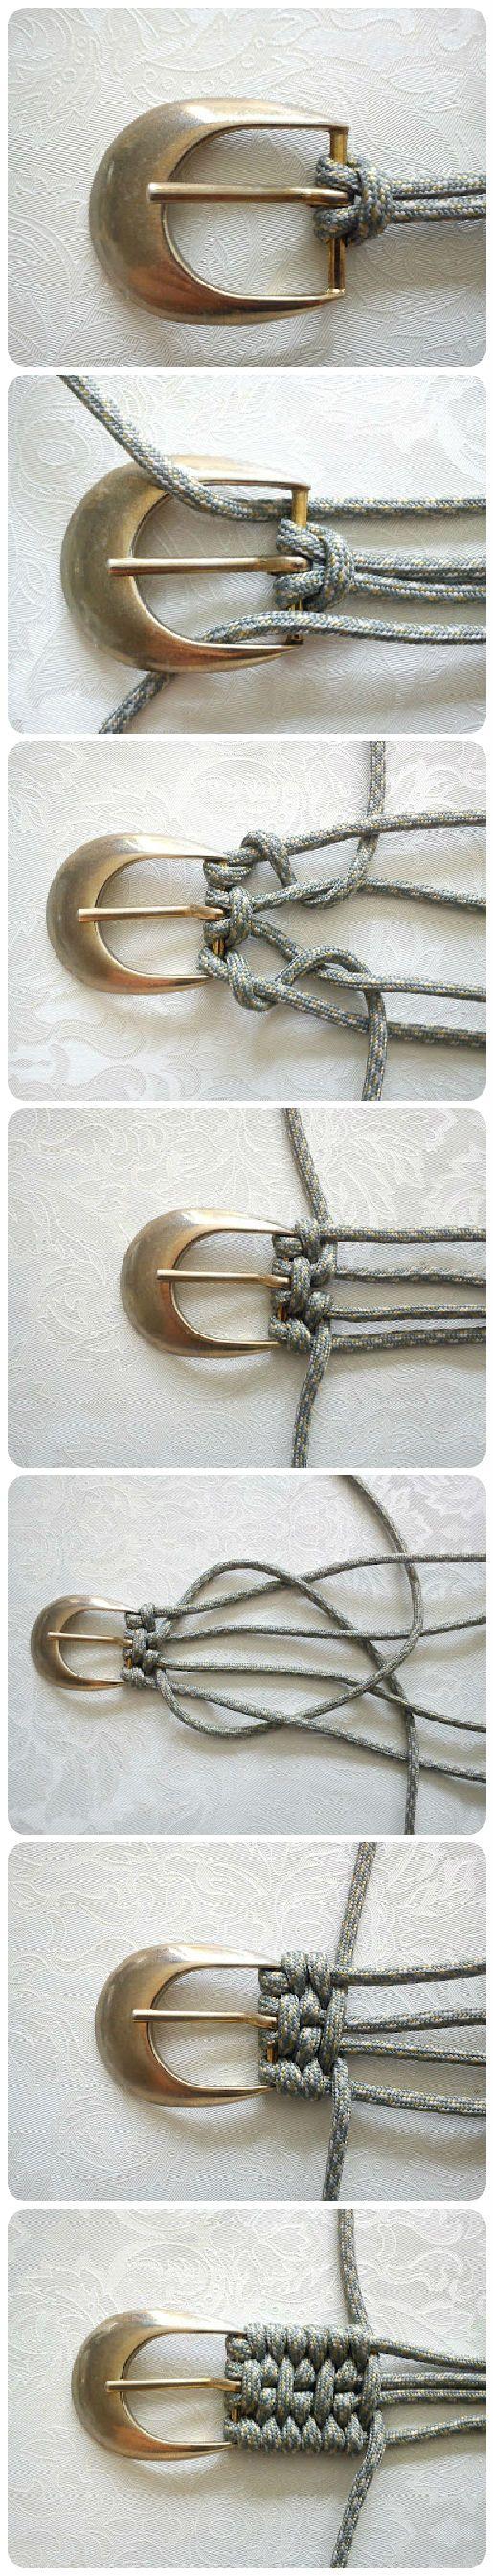 Tutorial for weaving a belt //Manbo